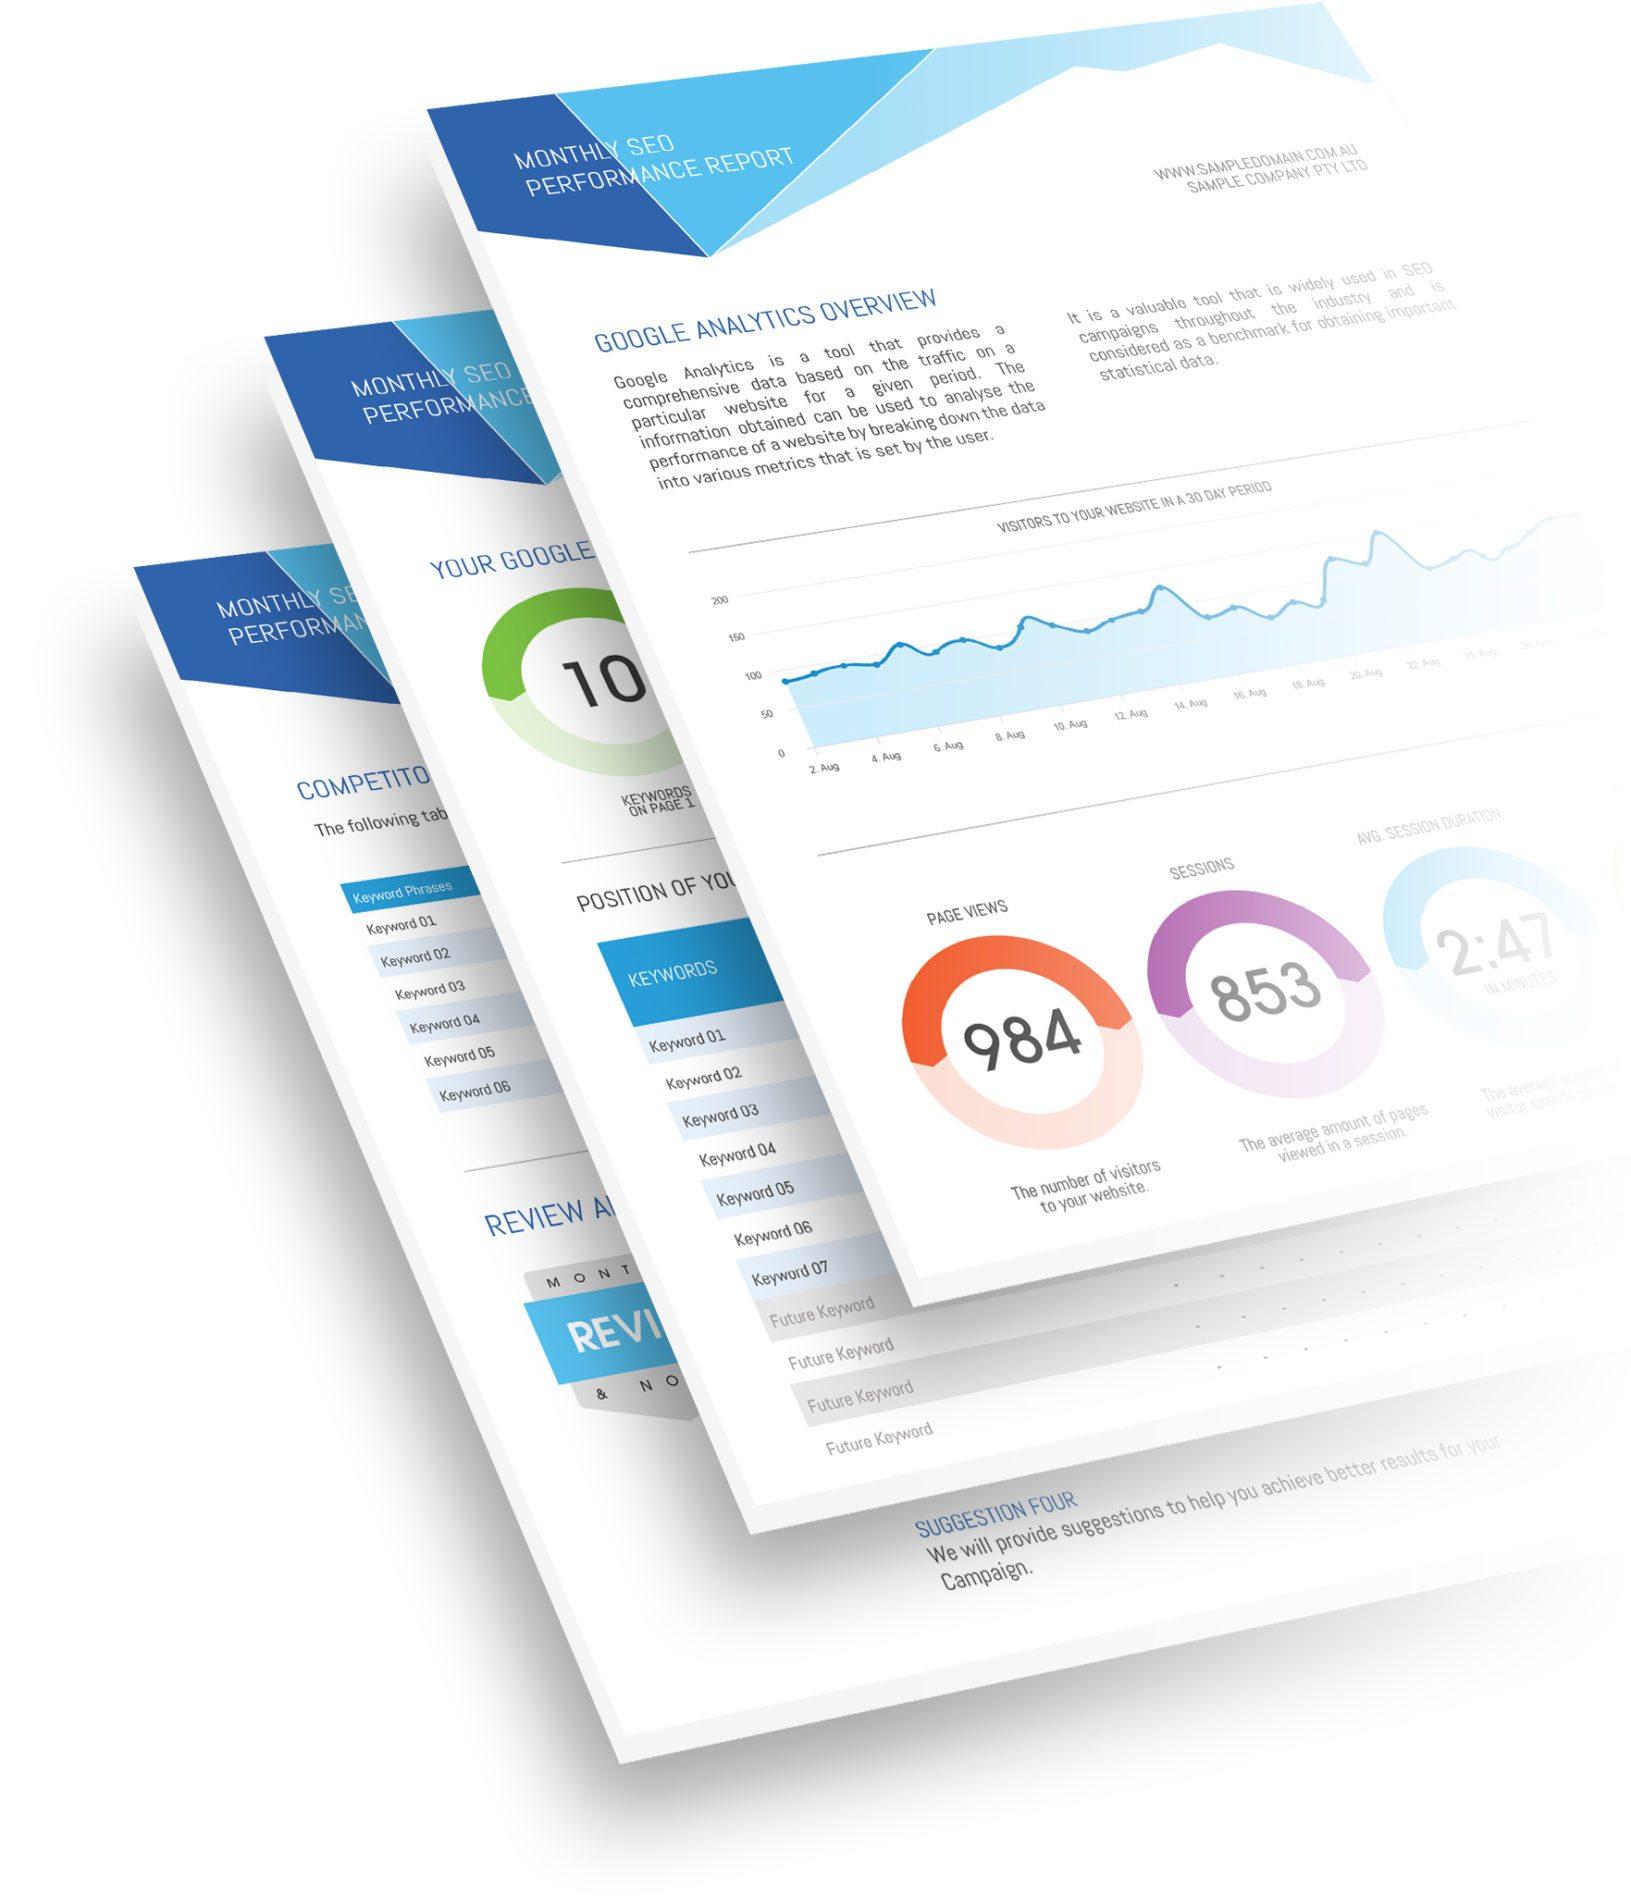 Sample SEO Reports - Cronulla Web Design